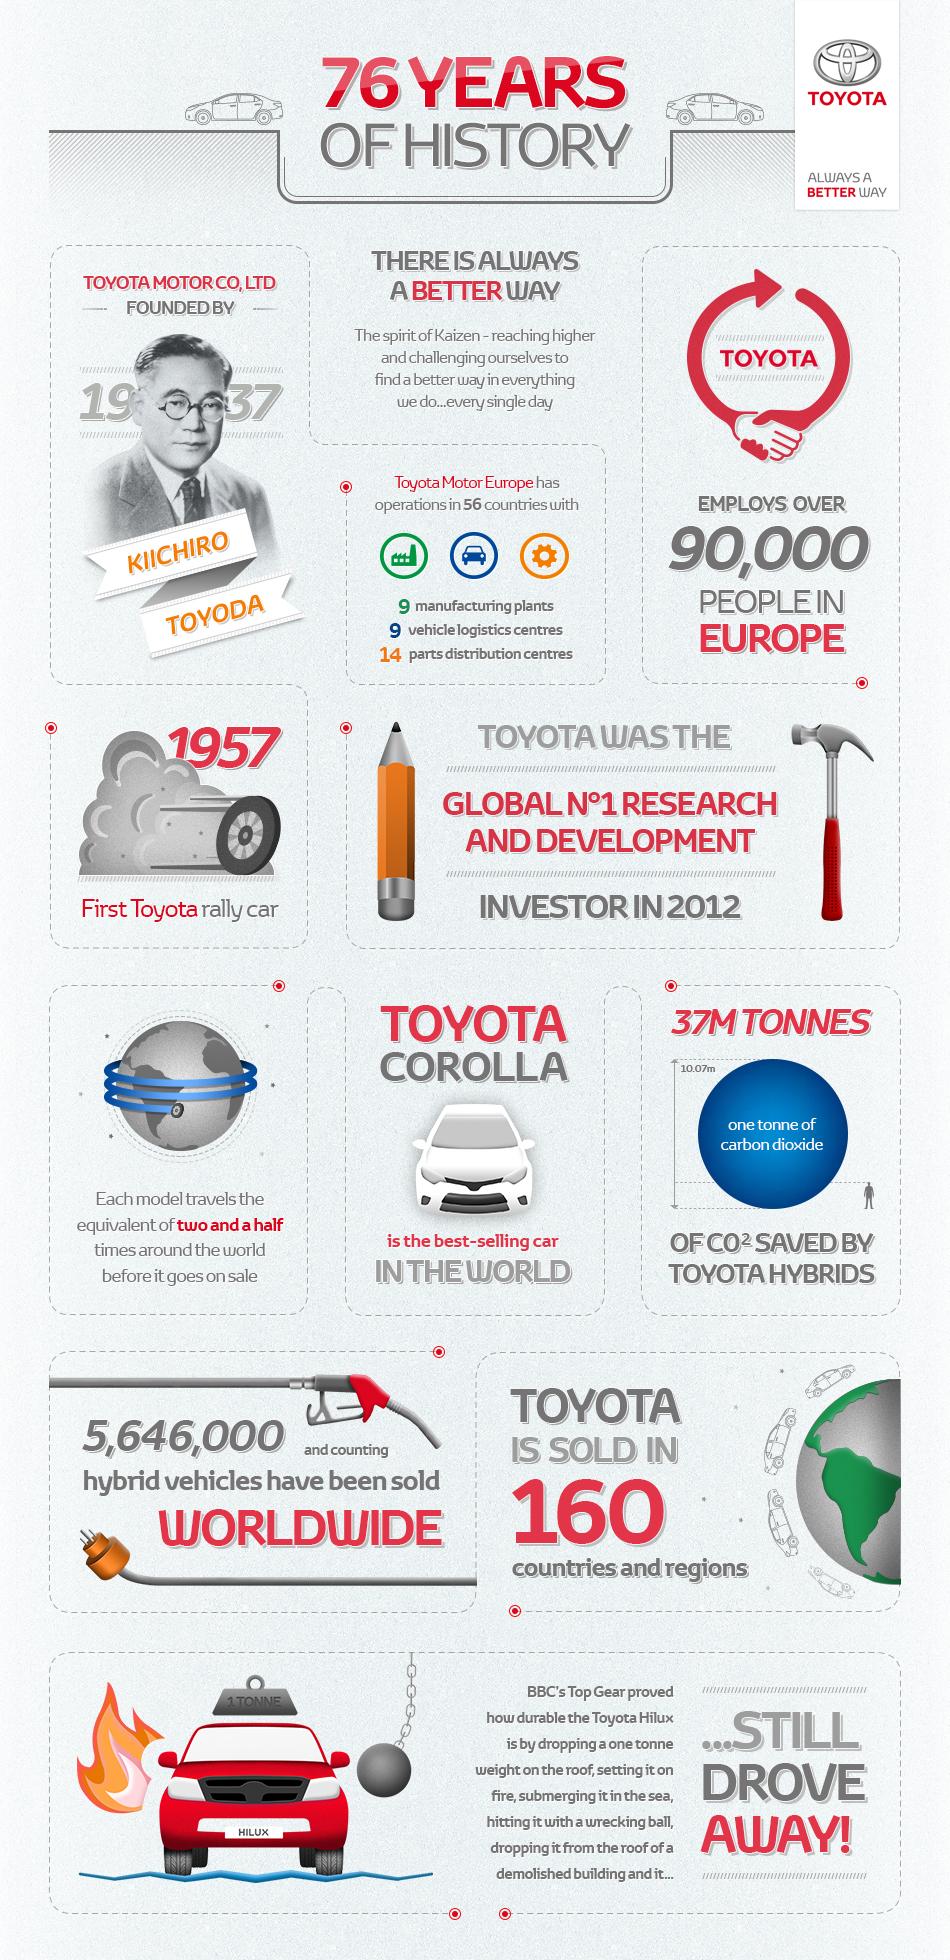 76 years of Toyota history infographic - Toyota